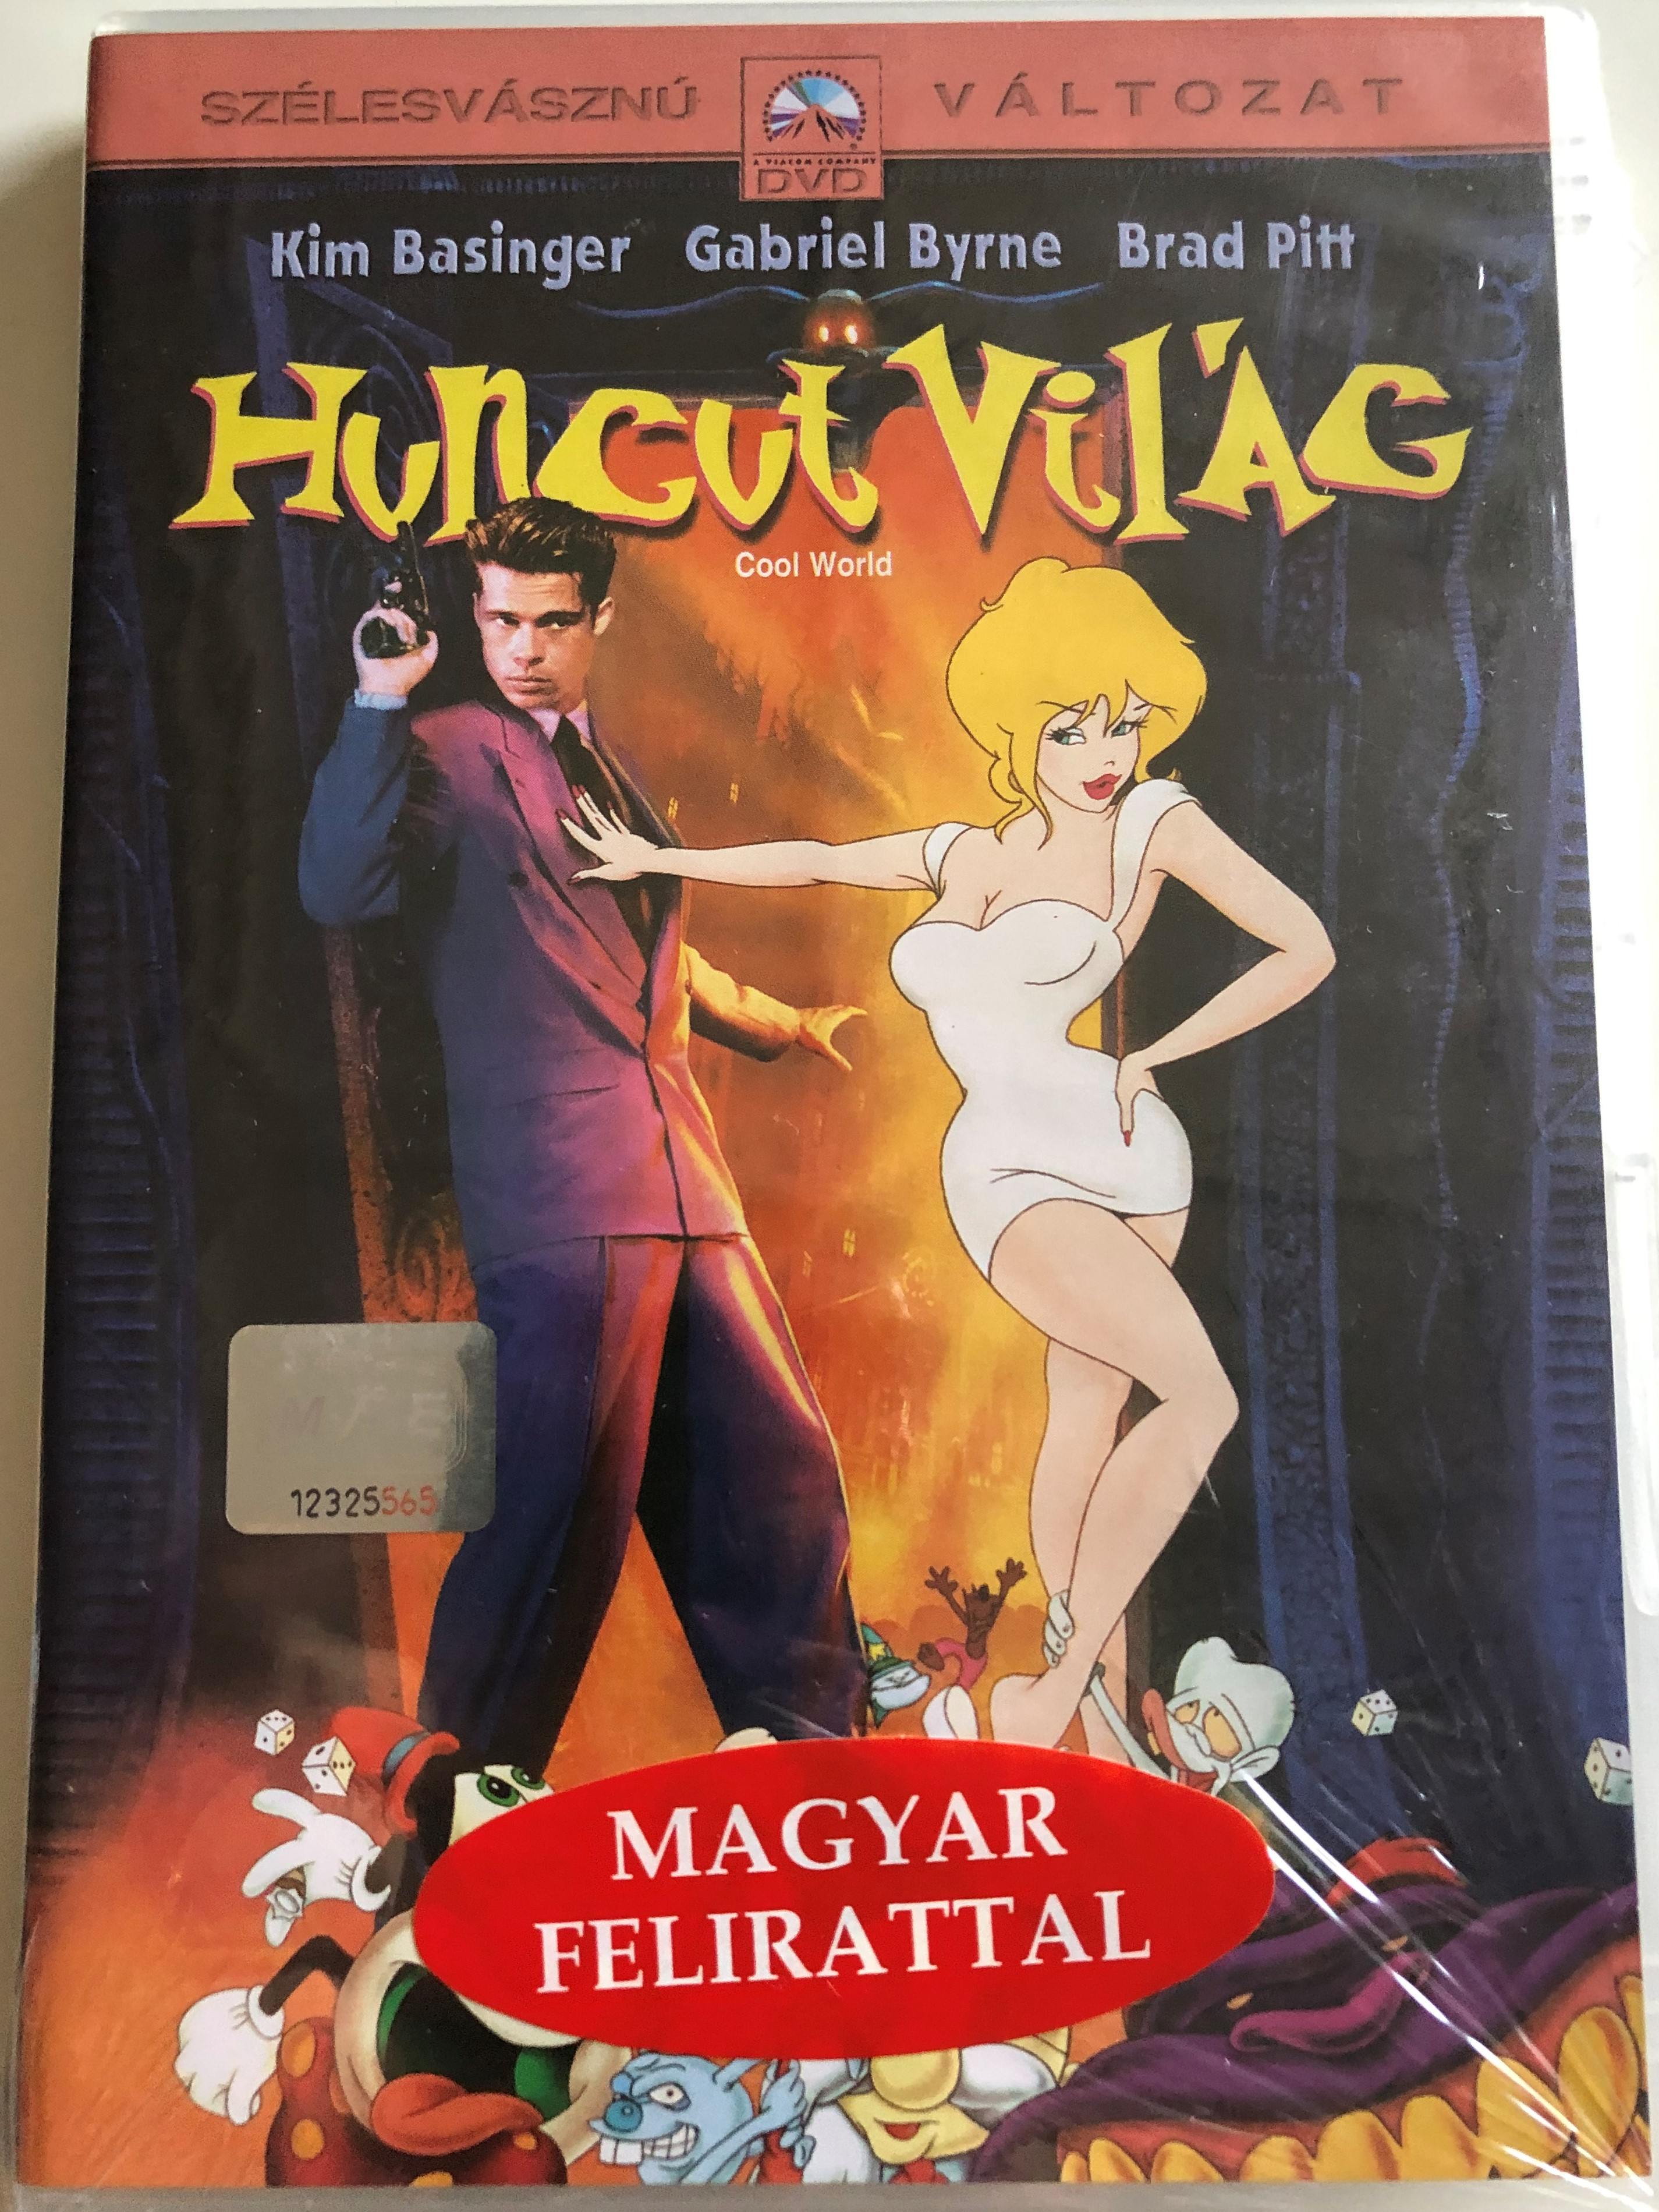 cool-world-dvd-1992-huncut-vil-g-1.jpg